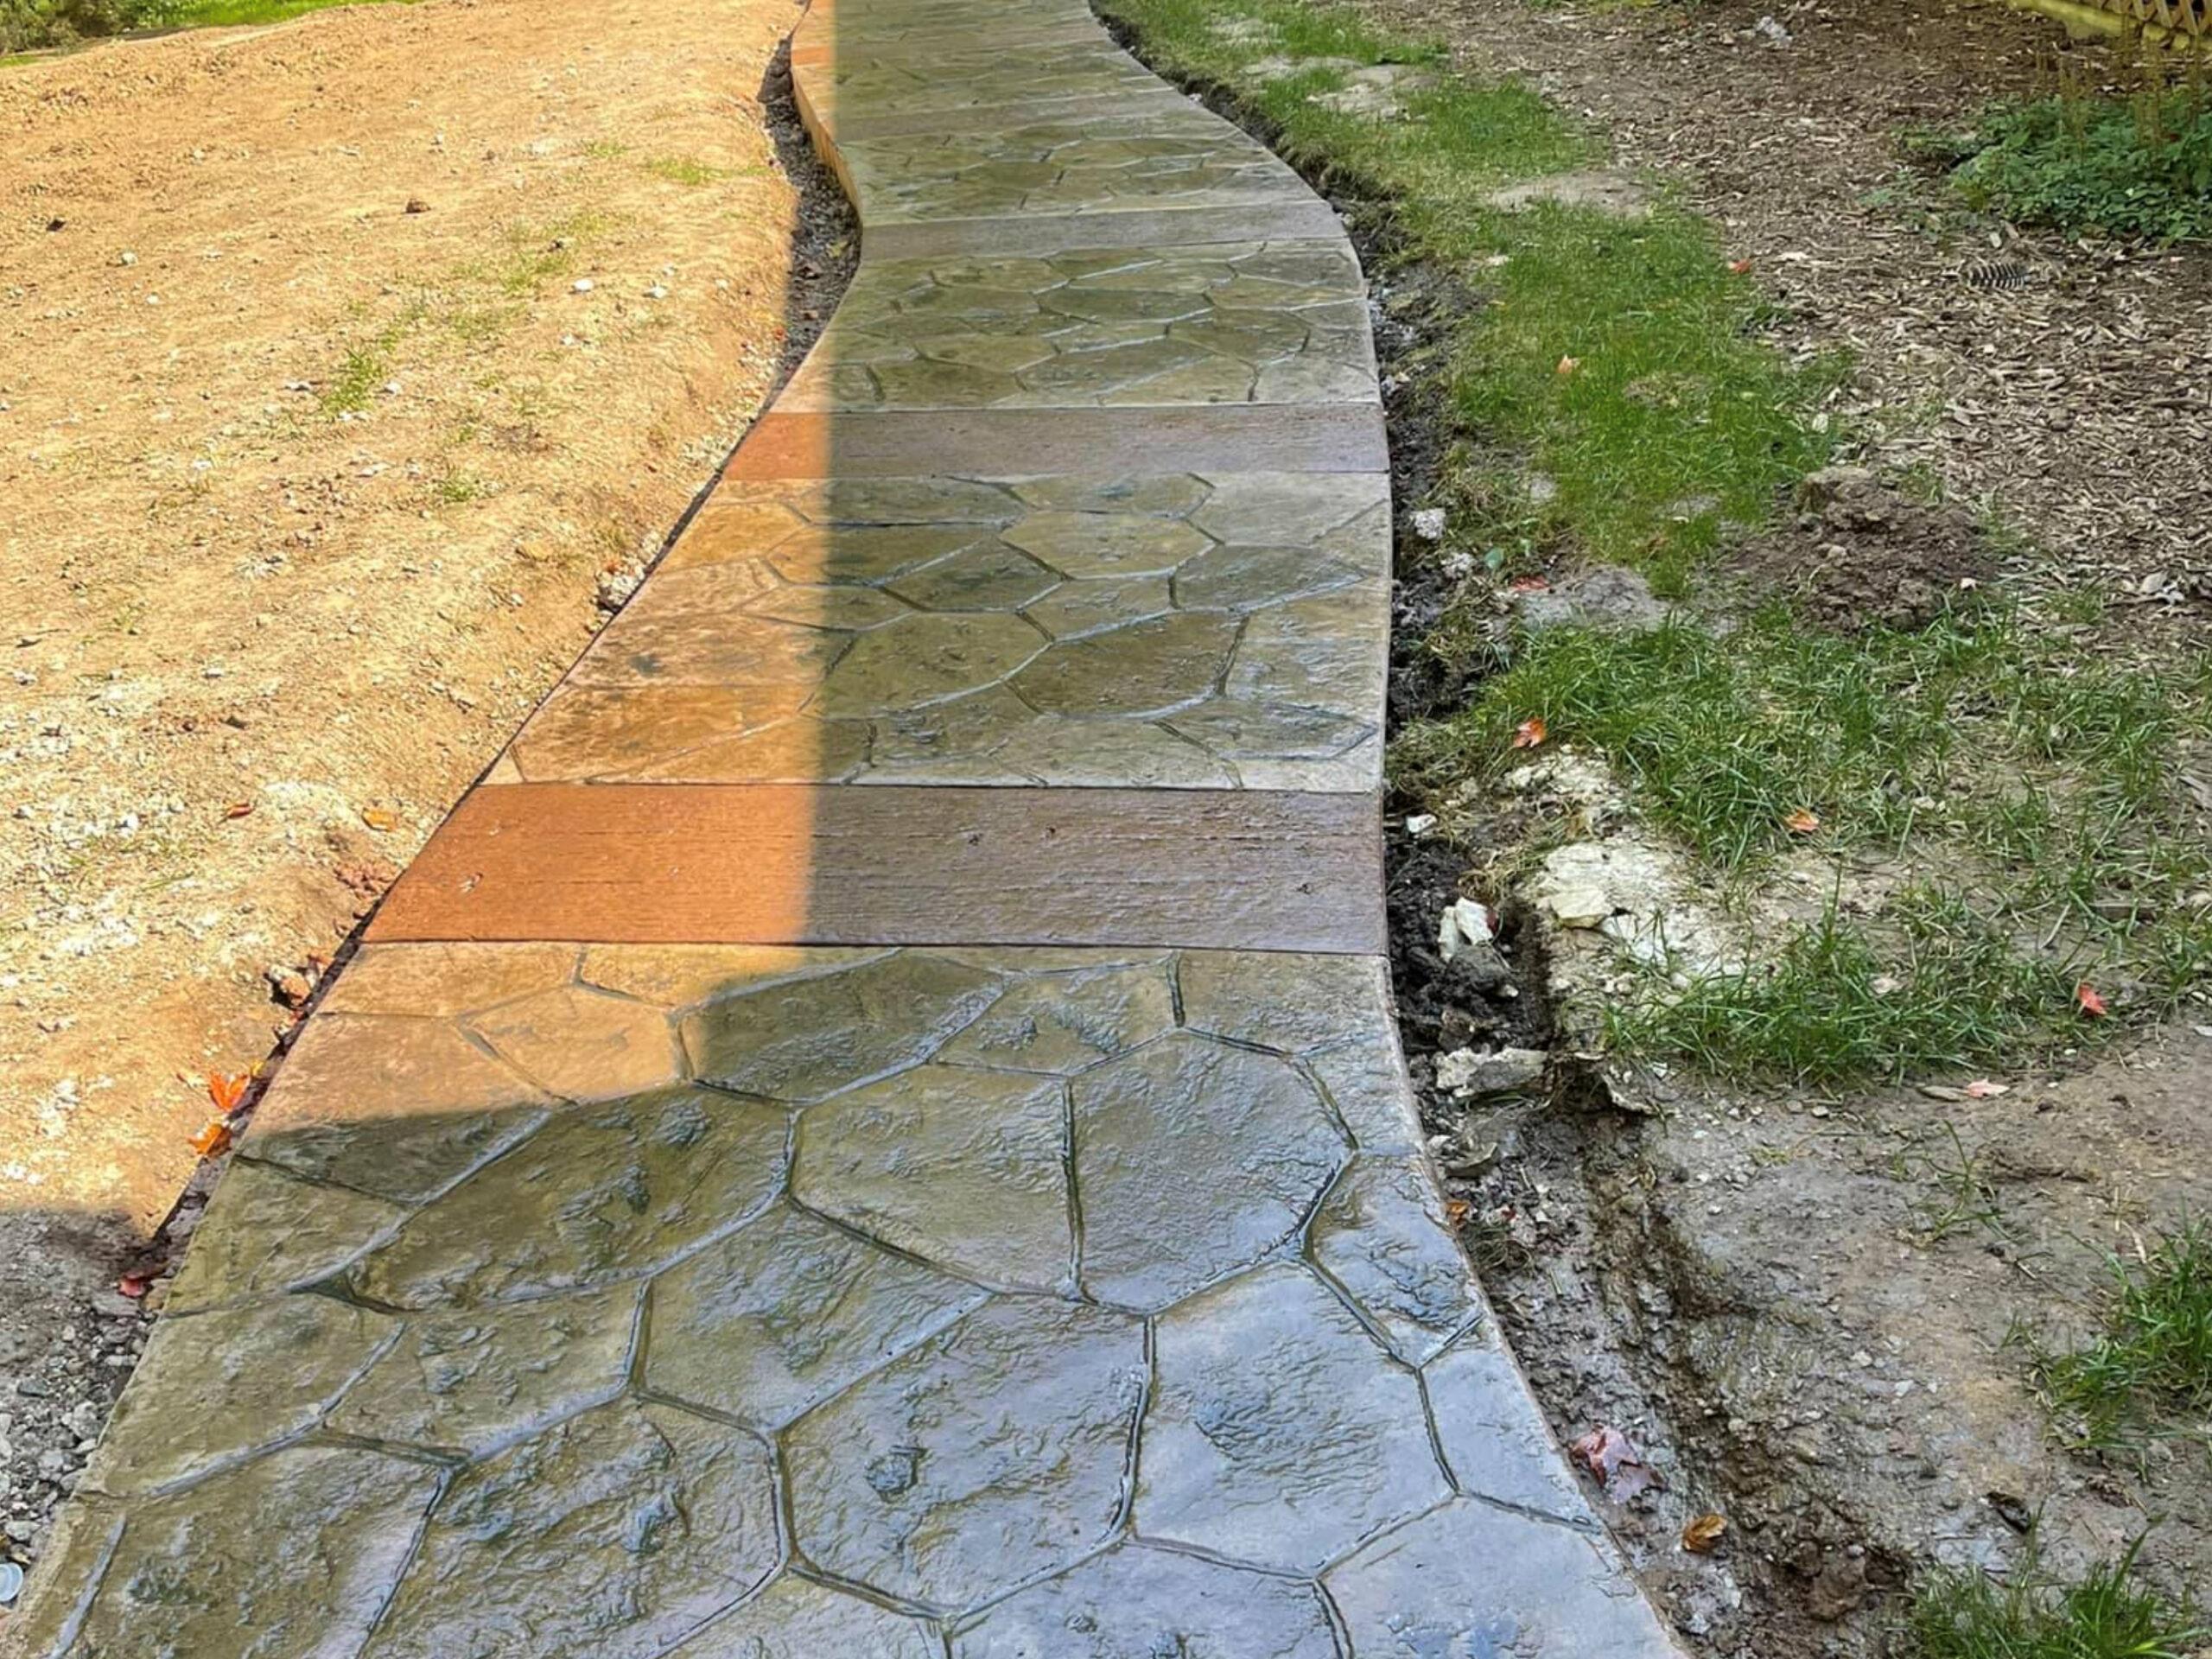 this image shows decorative concrete in Cupertino, California